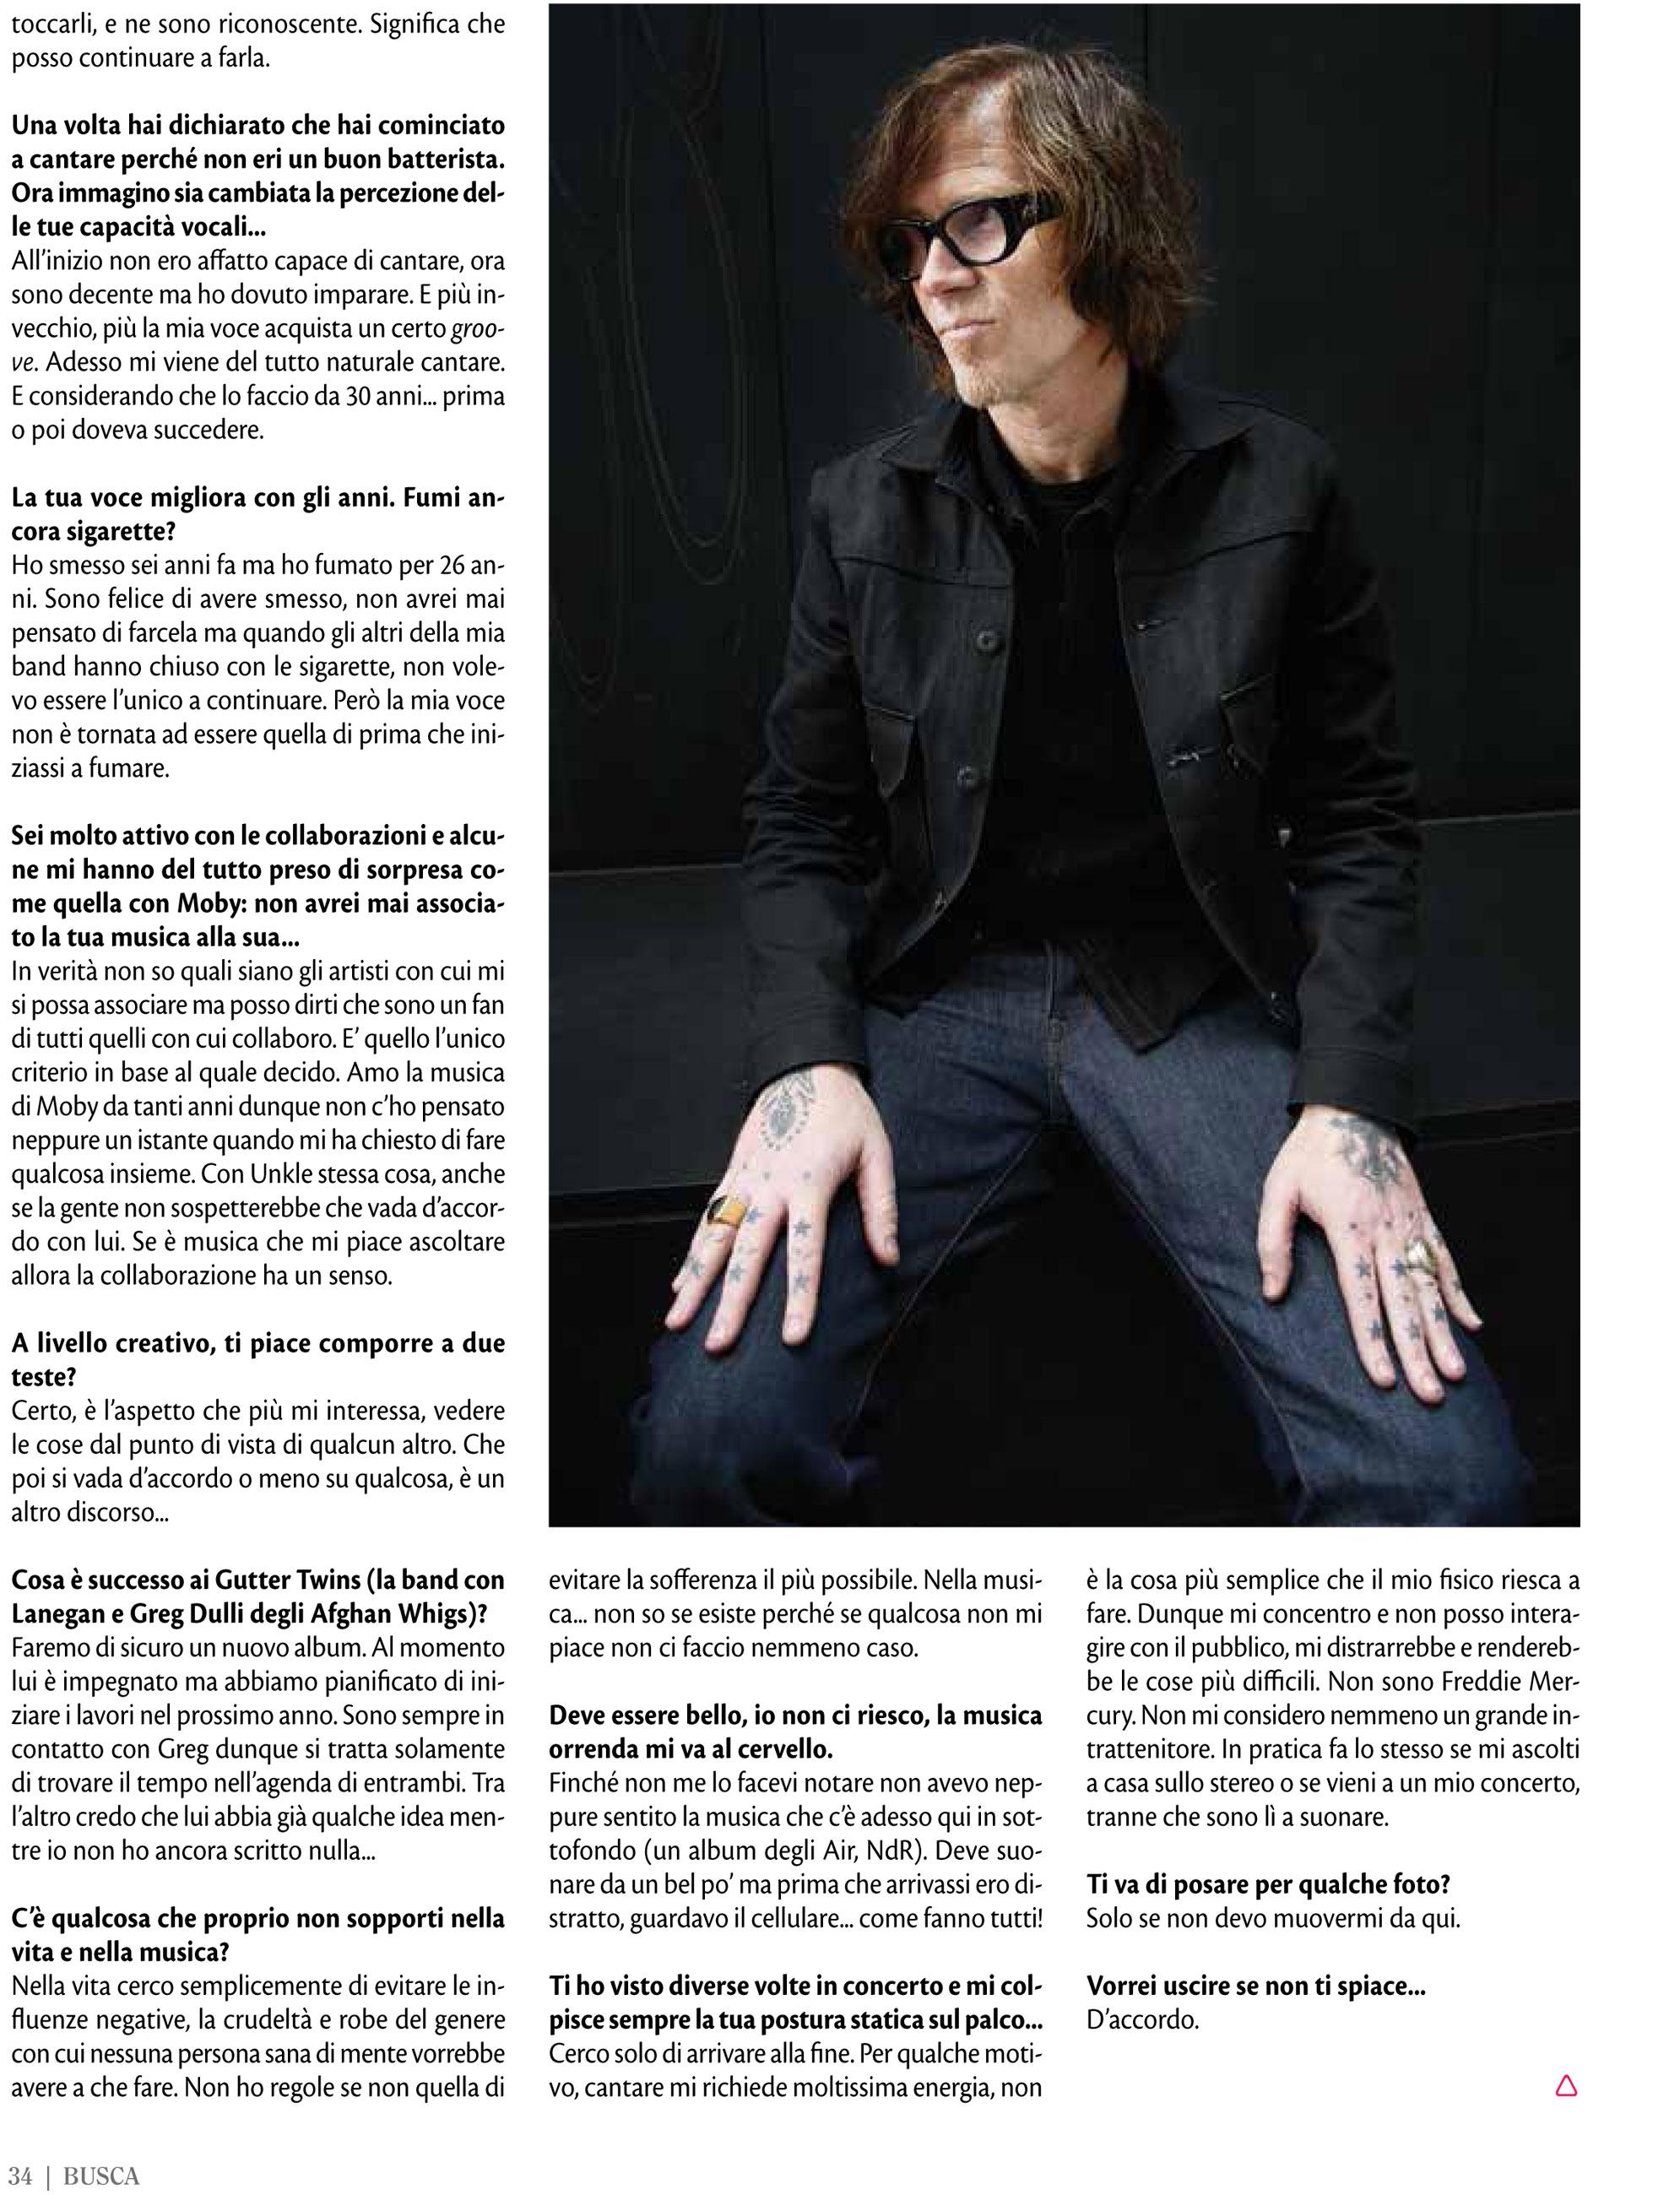 Buscadero: Mark Lanegan interview & photo